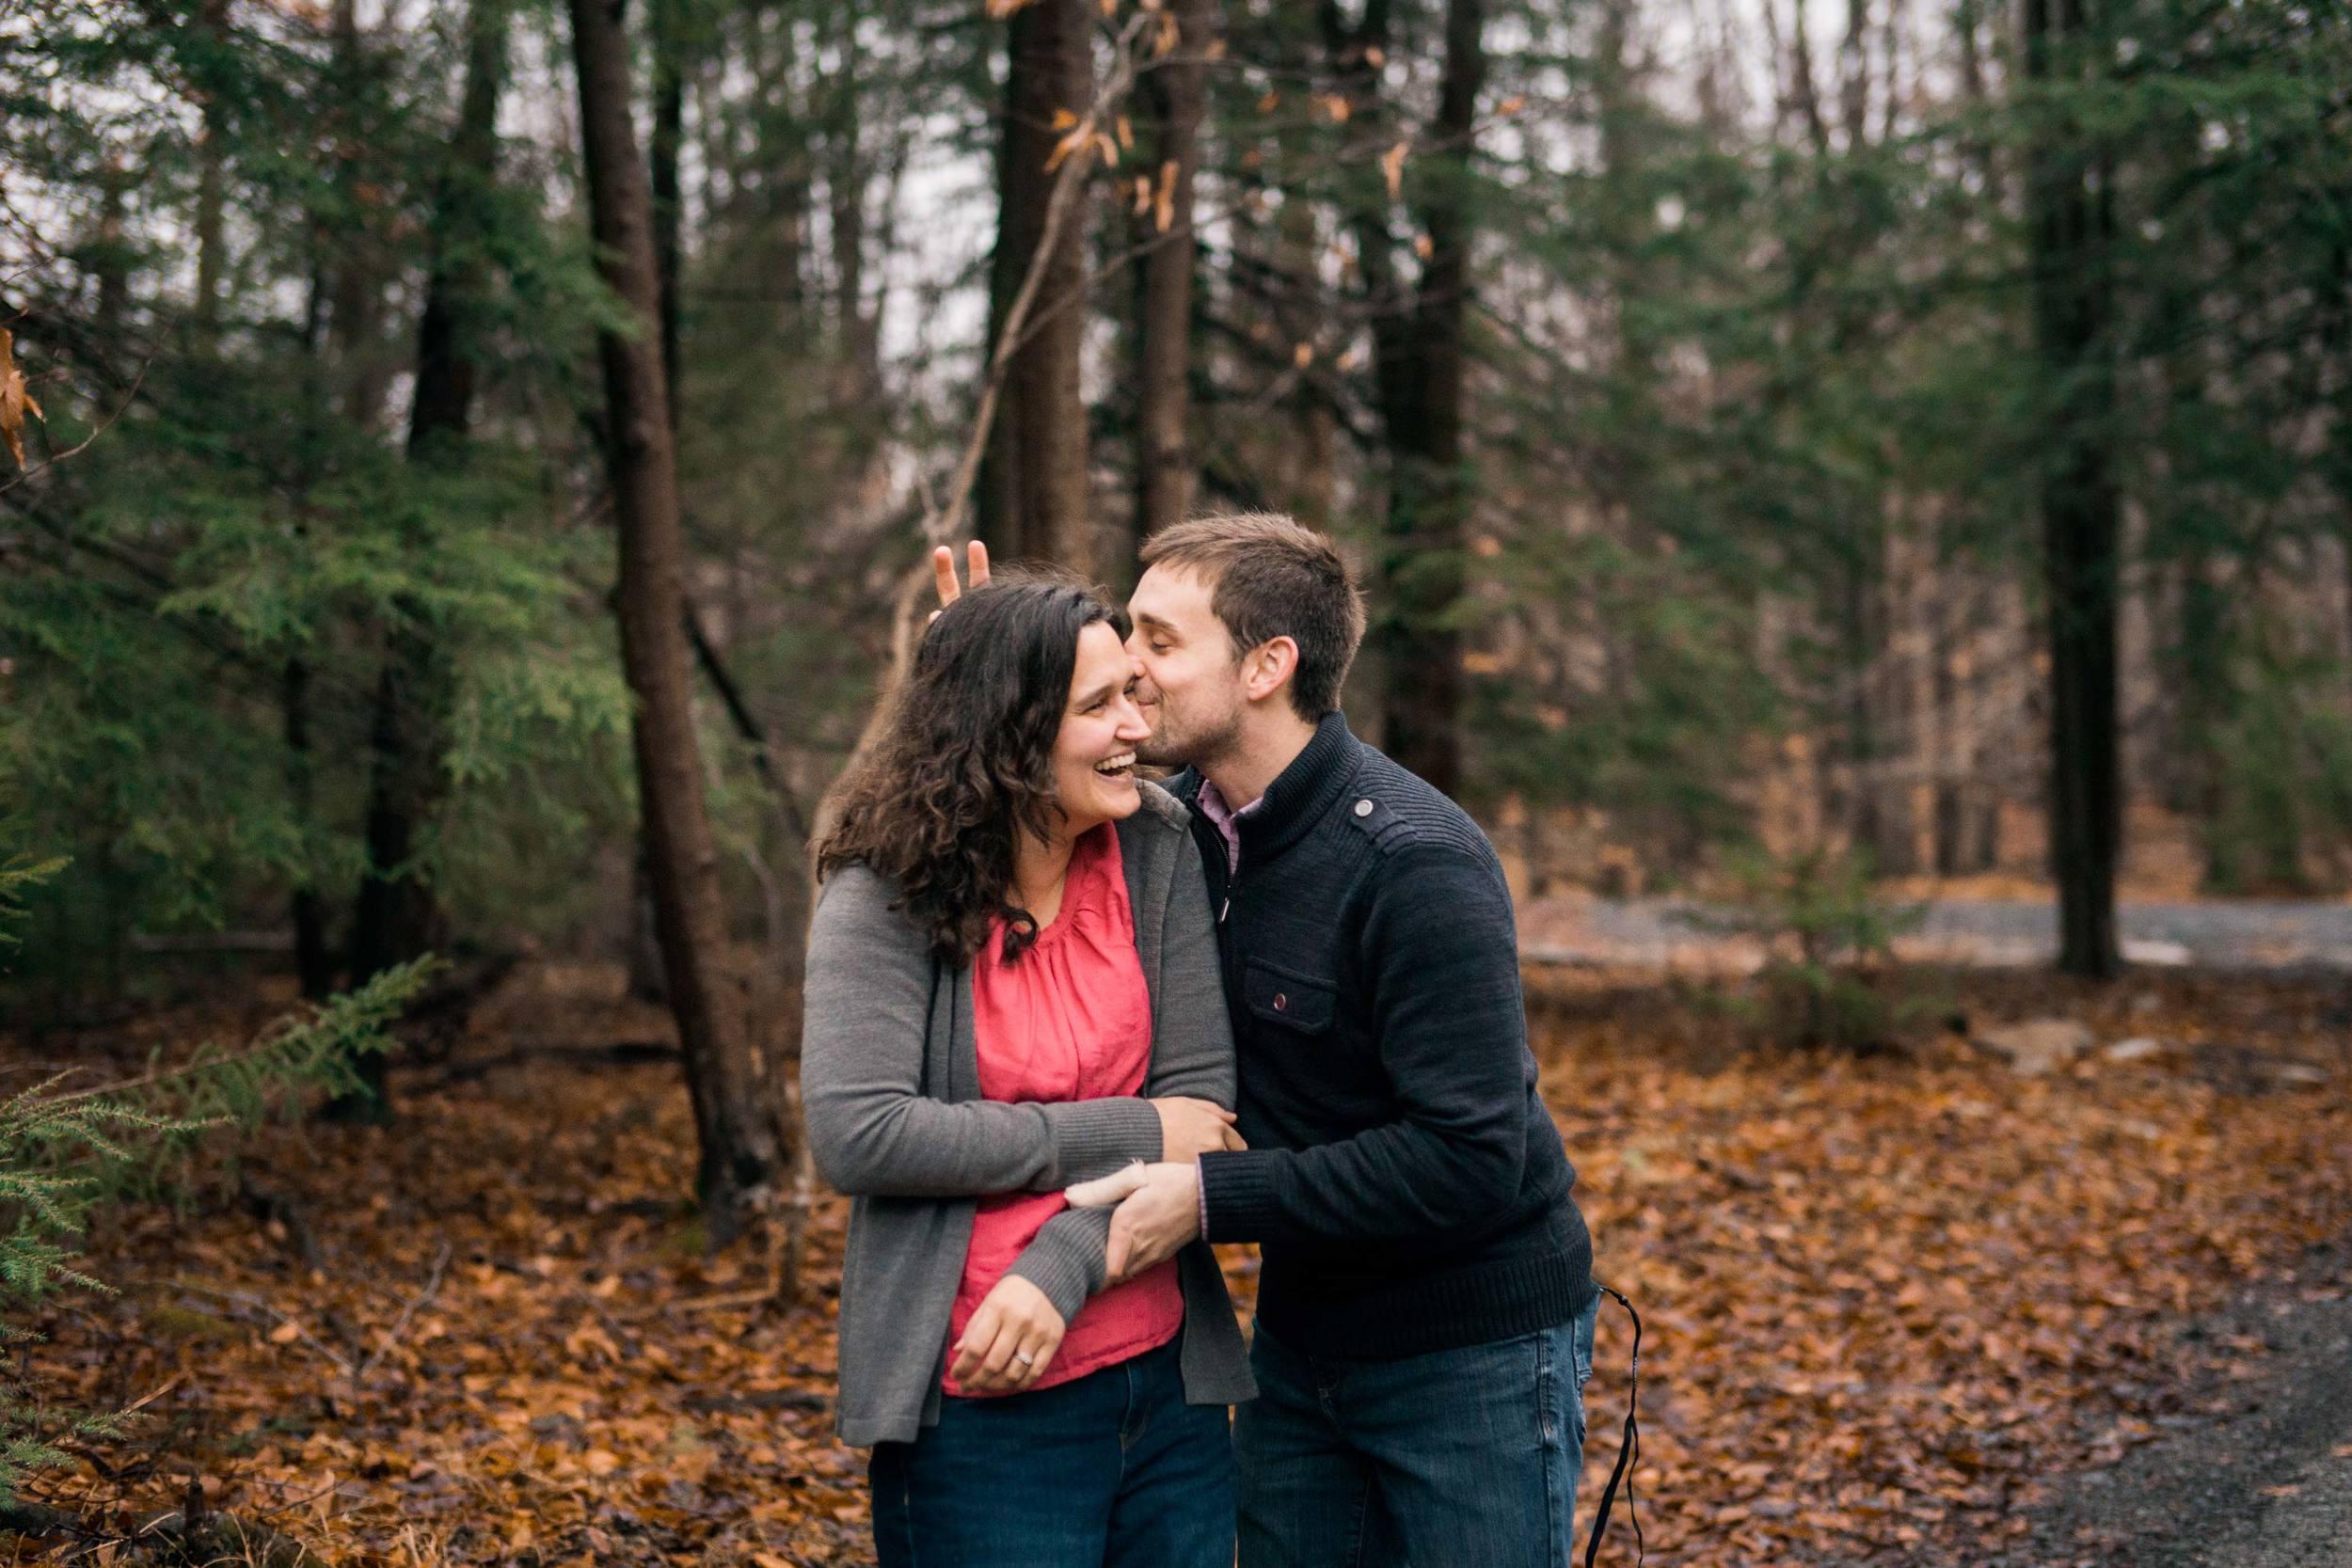 brett-smith-photo-married.jpg